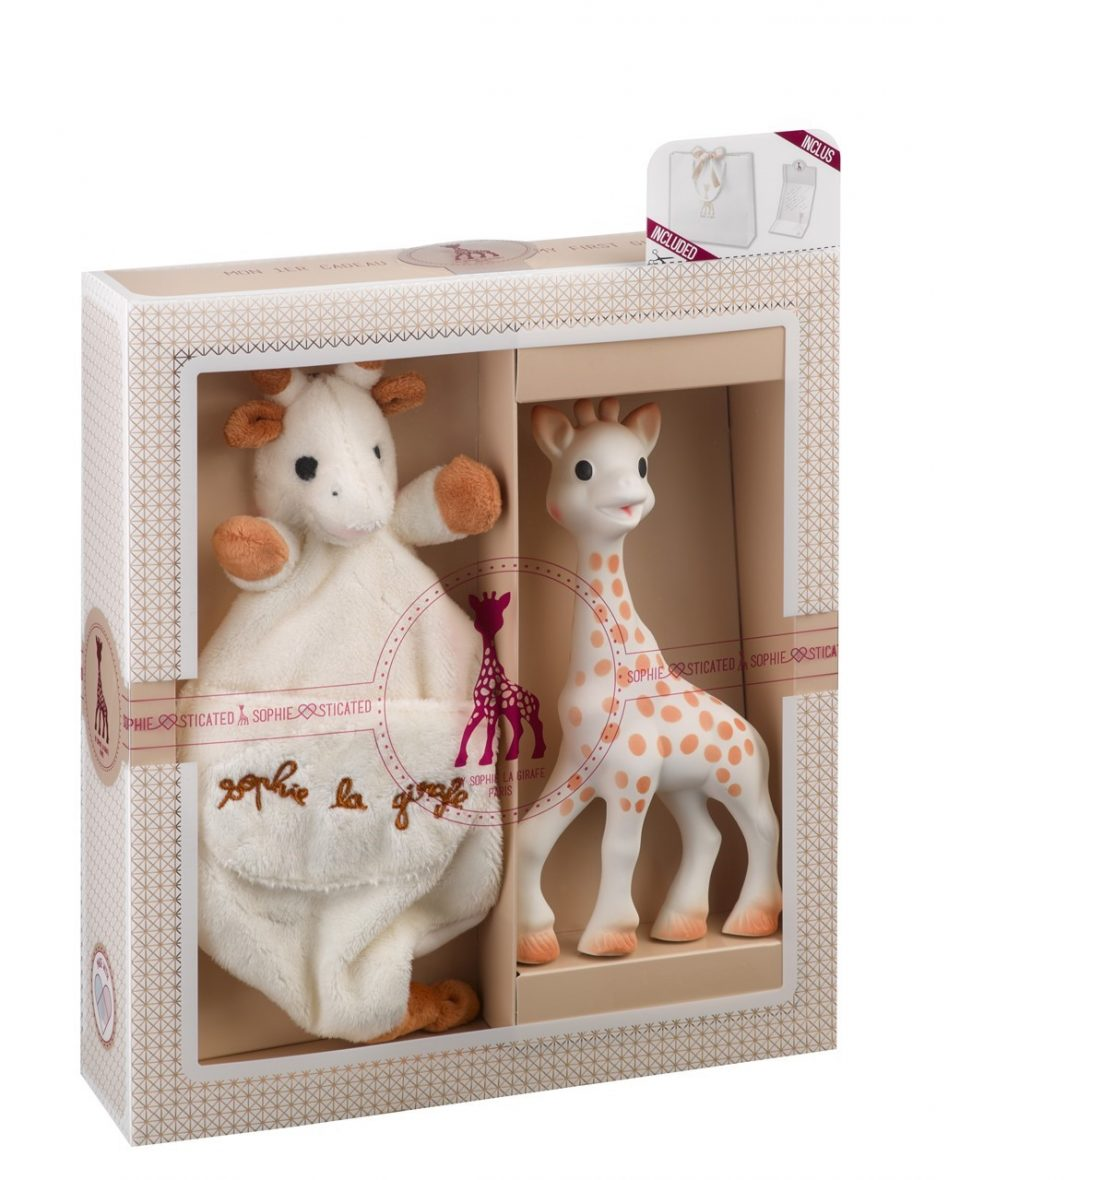 0013259-sophie-la-girafe-sophiesticated-yeni-dogan-seti-3